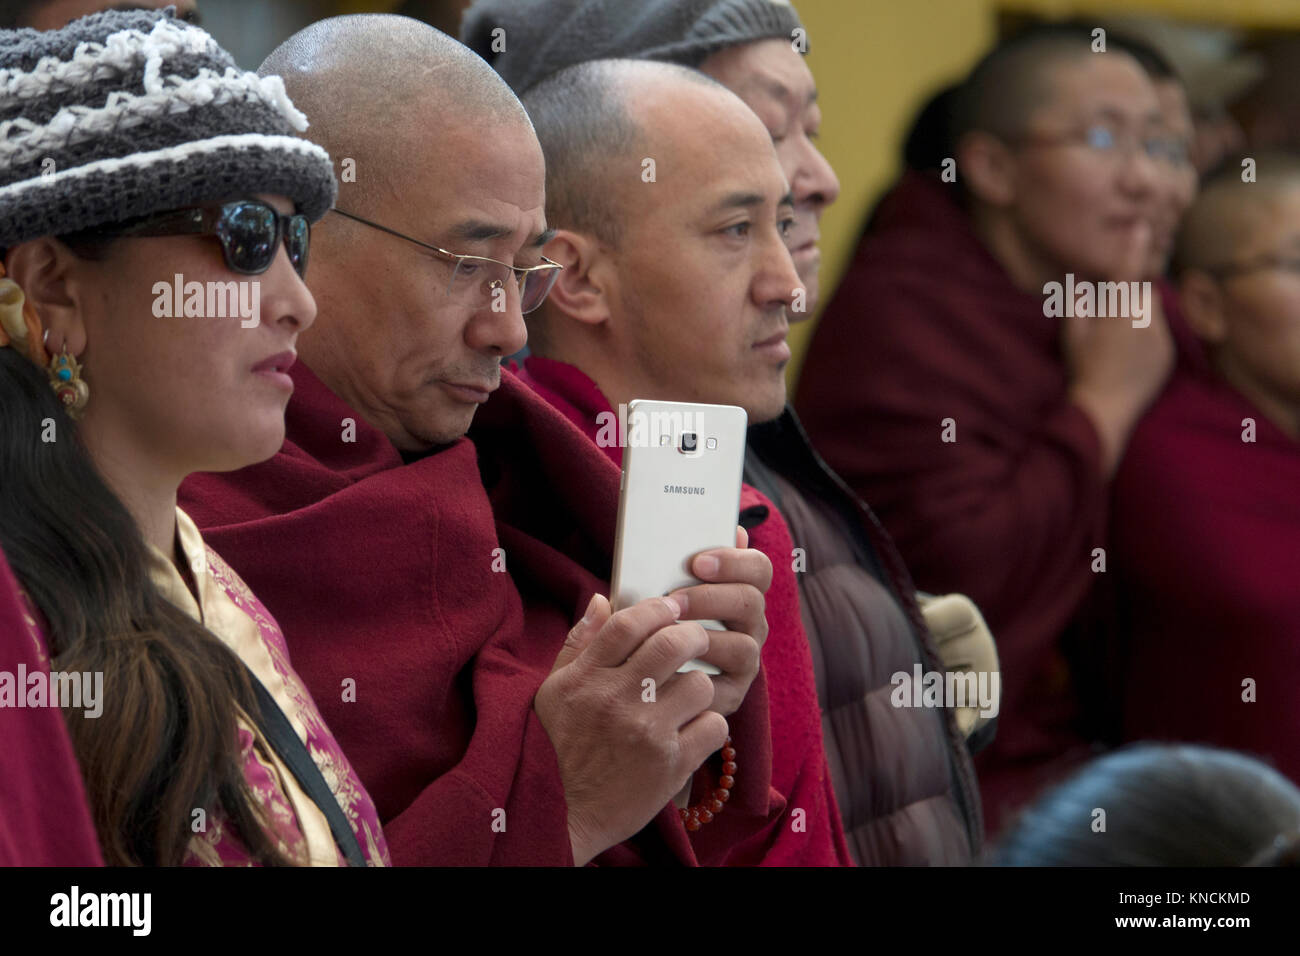 Tibetan monk uses Samsung smart phone to take a photo at Tsuglhakhang Complex in Mcleod Ganj - Stock Image